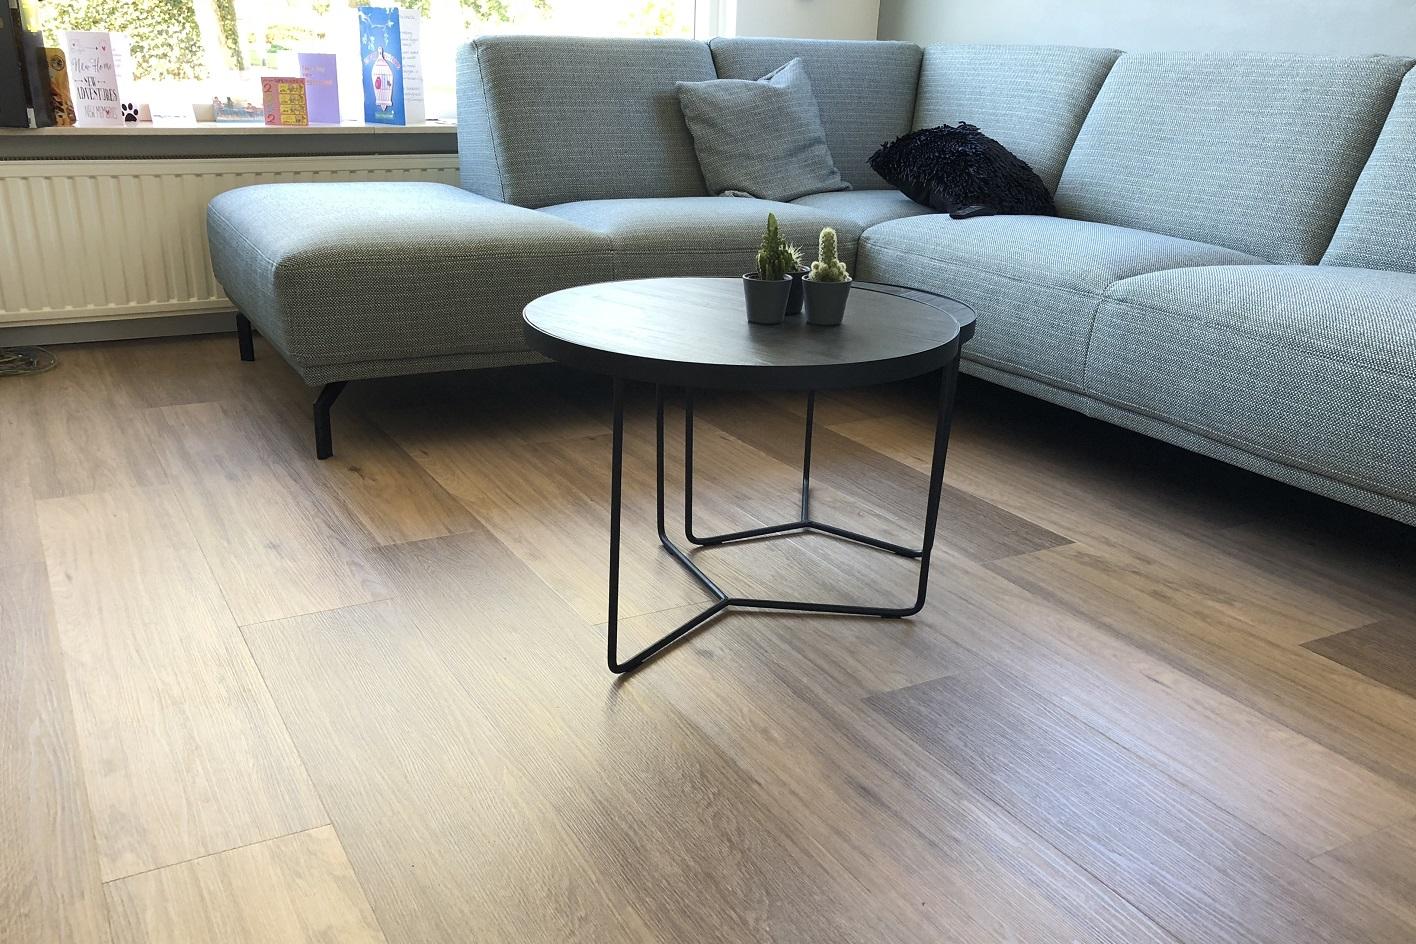 LVT flooring mimics the look of real wood, ceramic or stone flooring